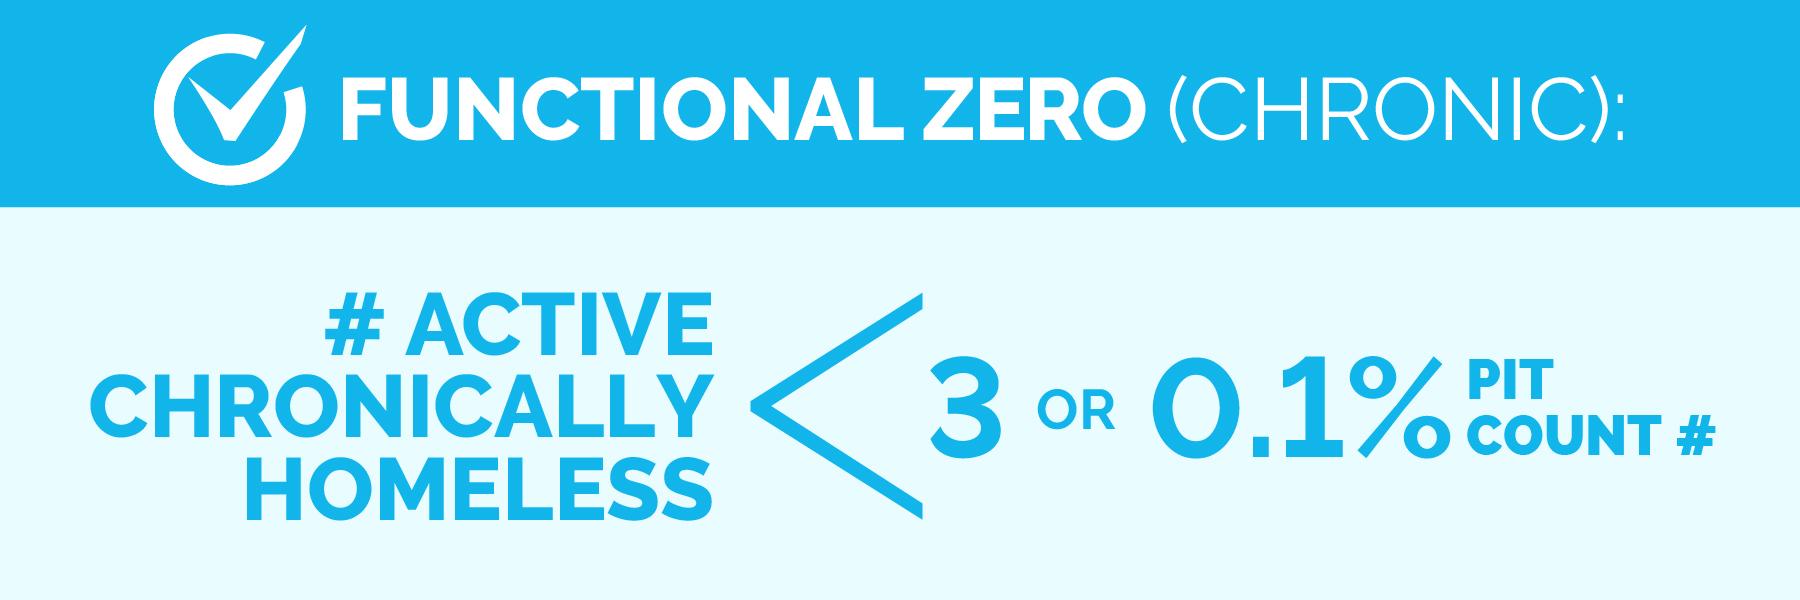 Functional zero definition